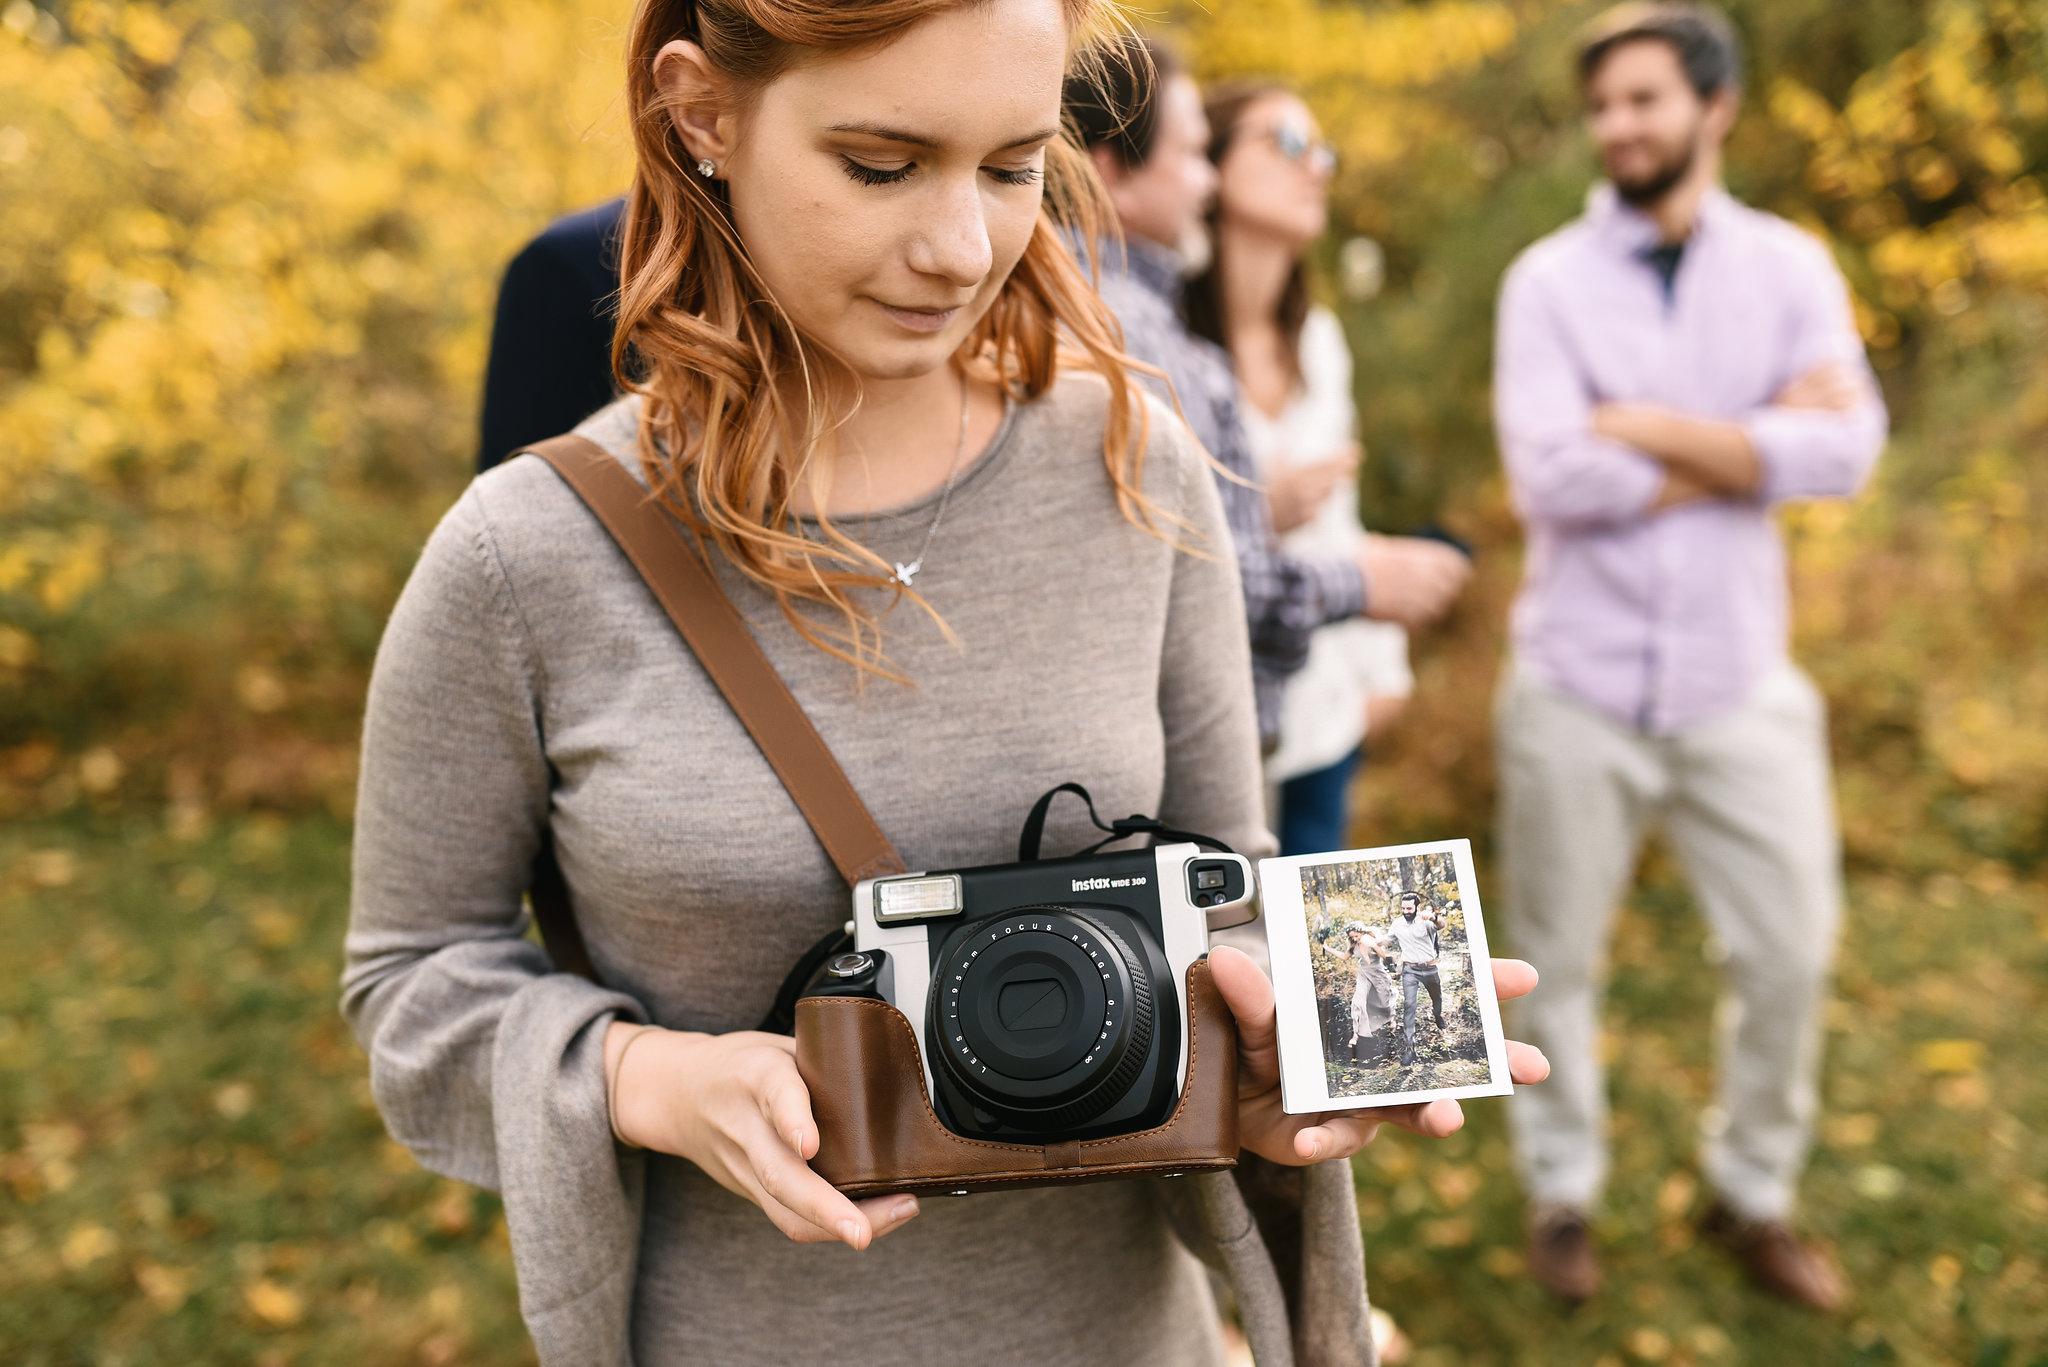 Baltimore, Maryland Wedding Photographer, Backyard Wedding, DIY, Rustic, Casual, Fall Wedding, Woodland, Wedding Guest with Polaroid Camera